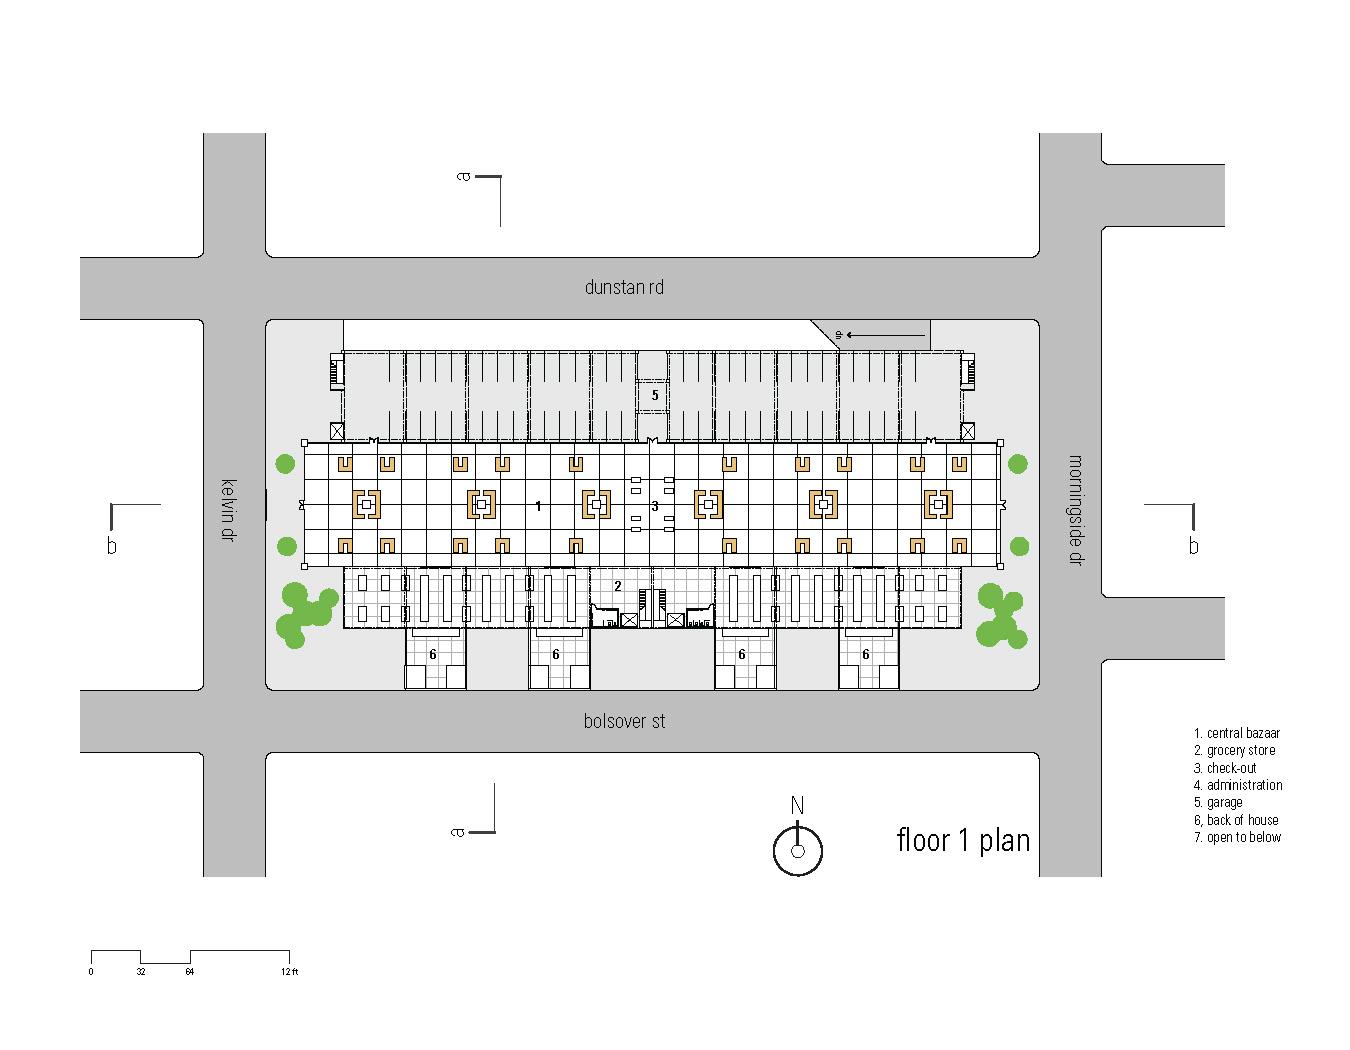 Greengrocer808 1st floor plan